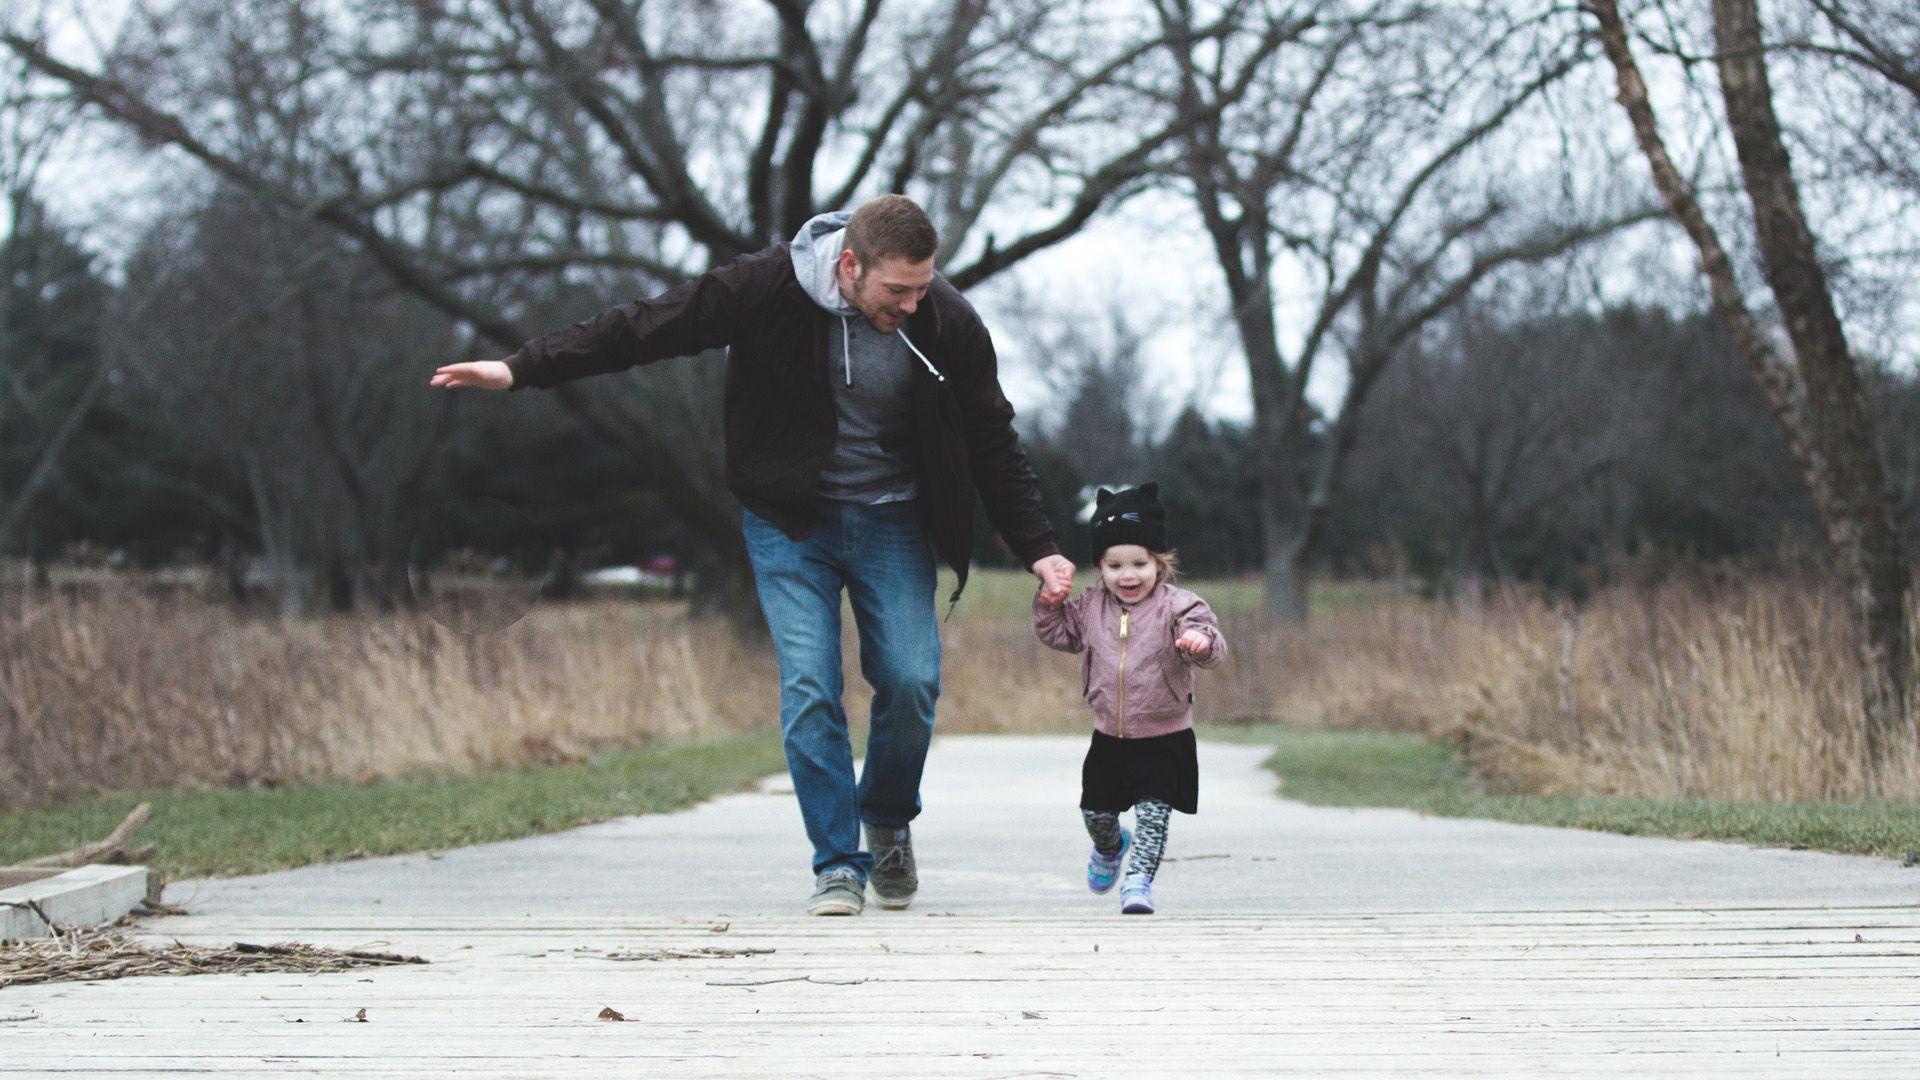 Vater-Tochter-Schule überspringen